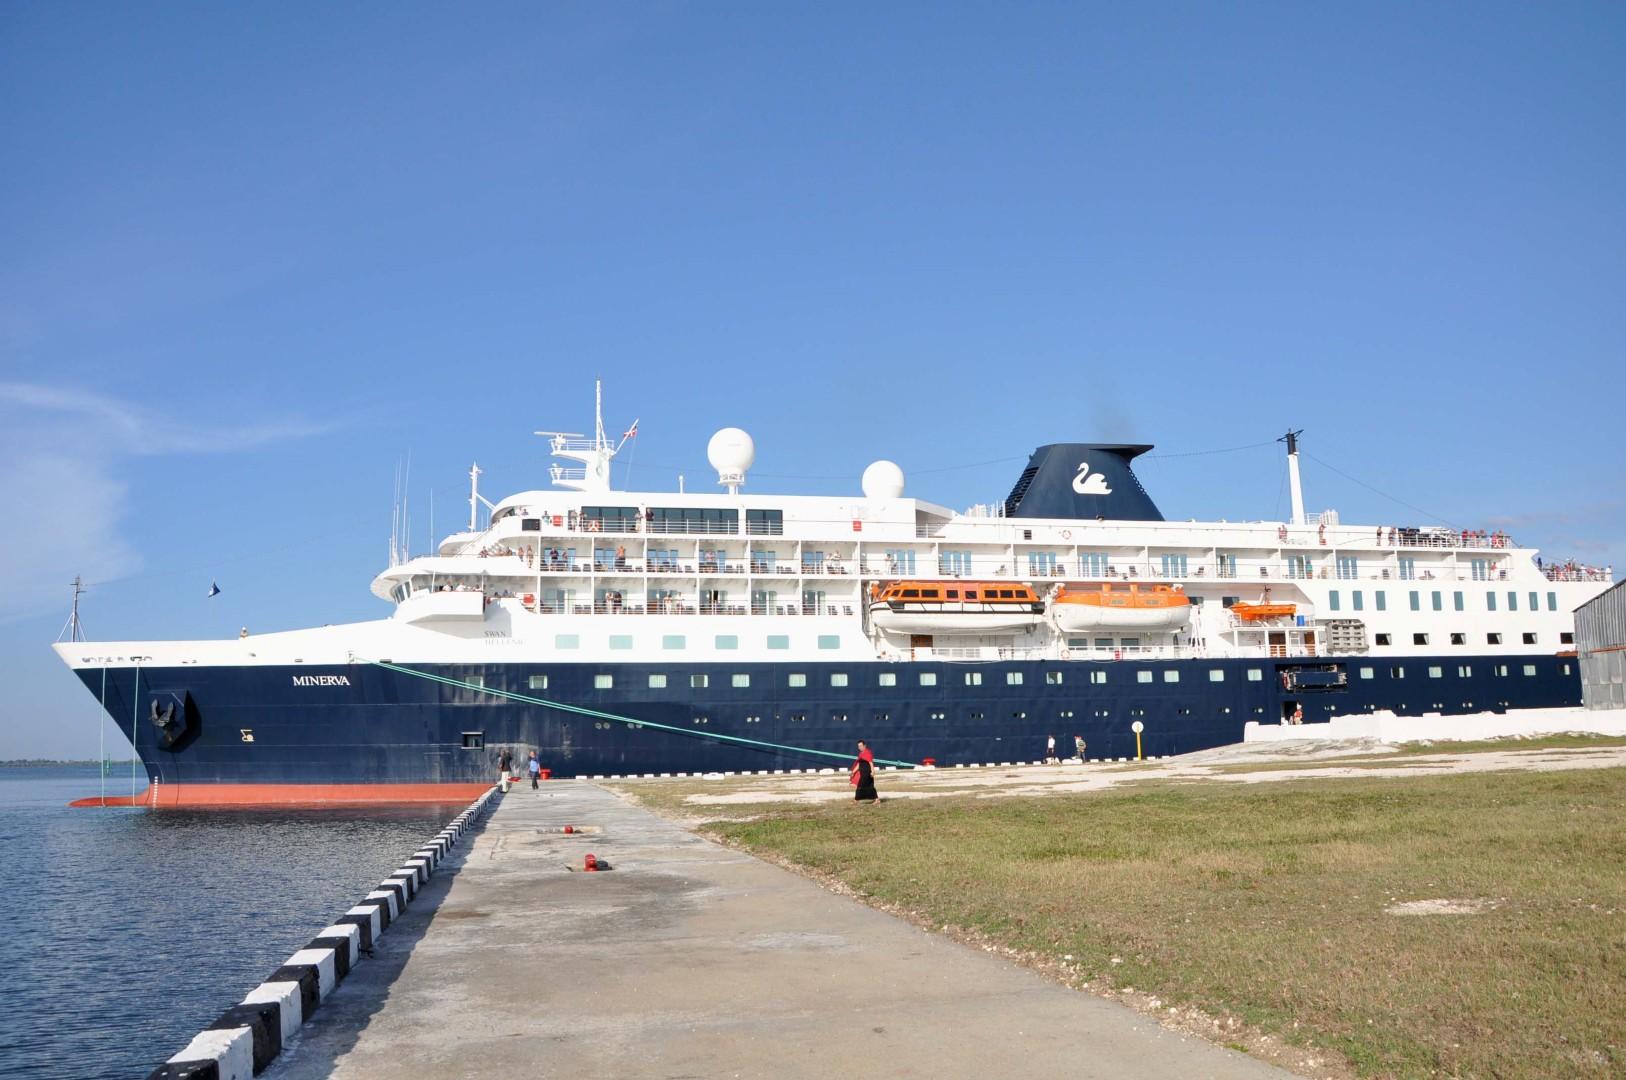 turismo, Trinidad, cruceros